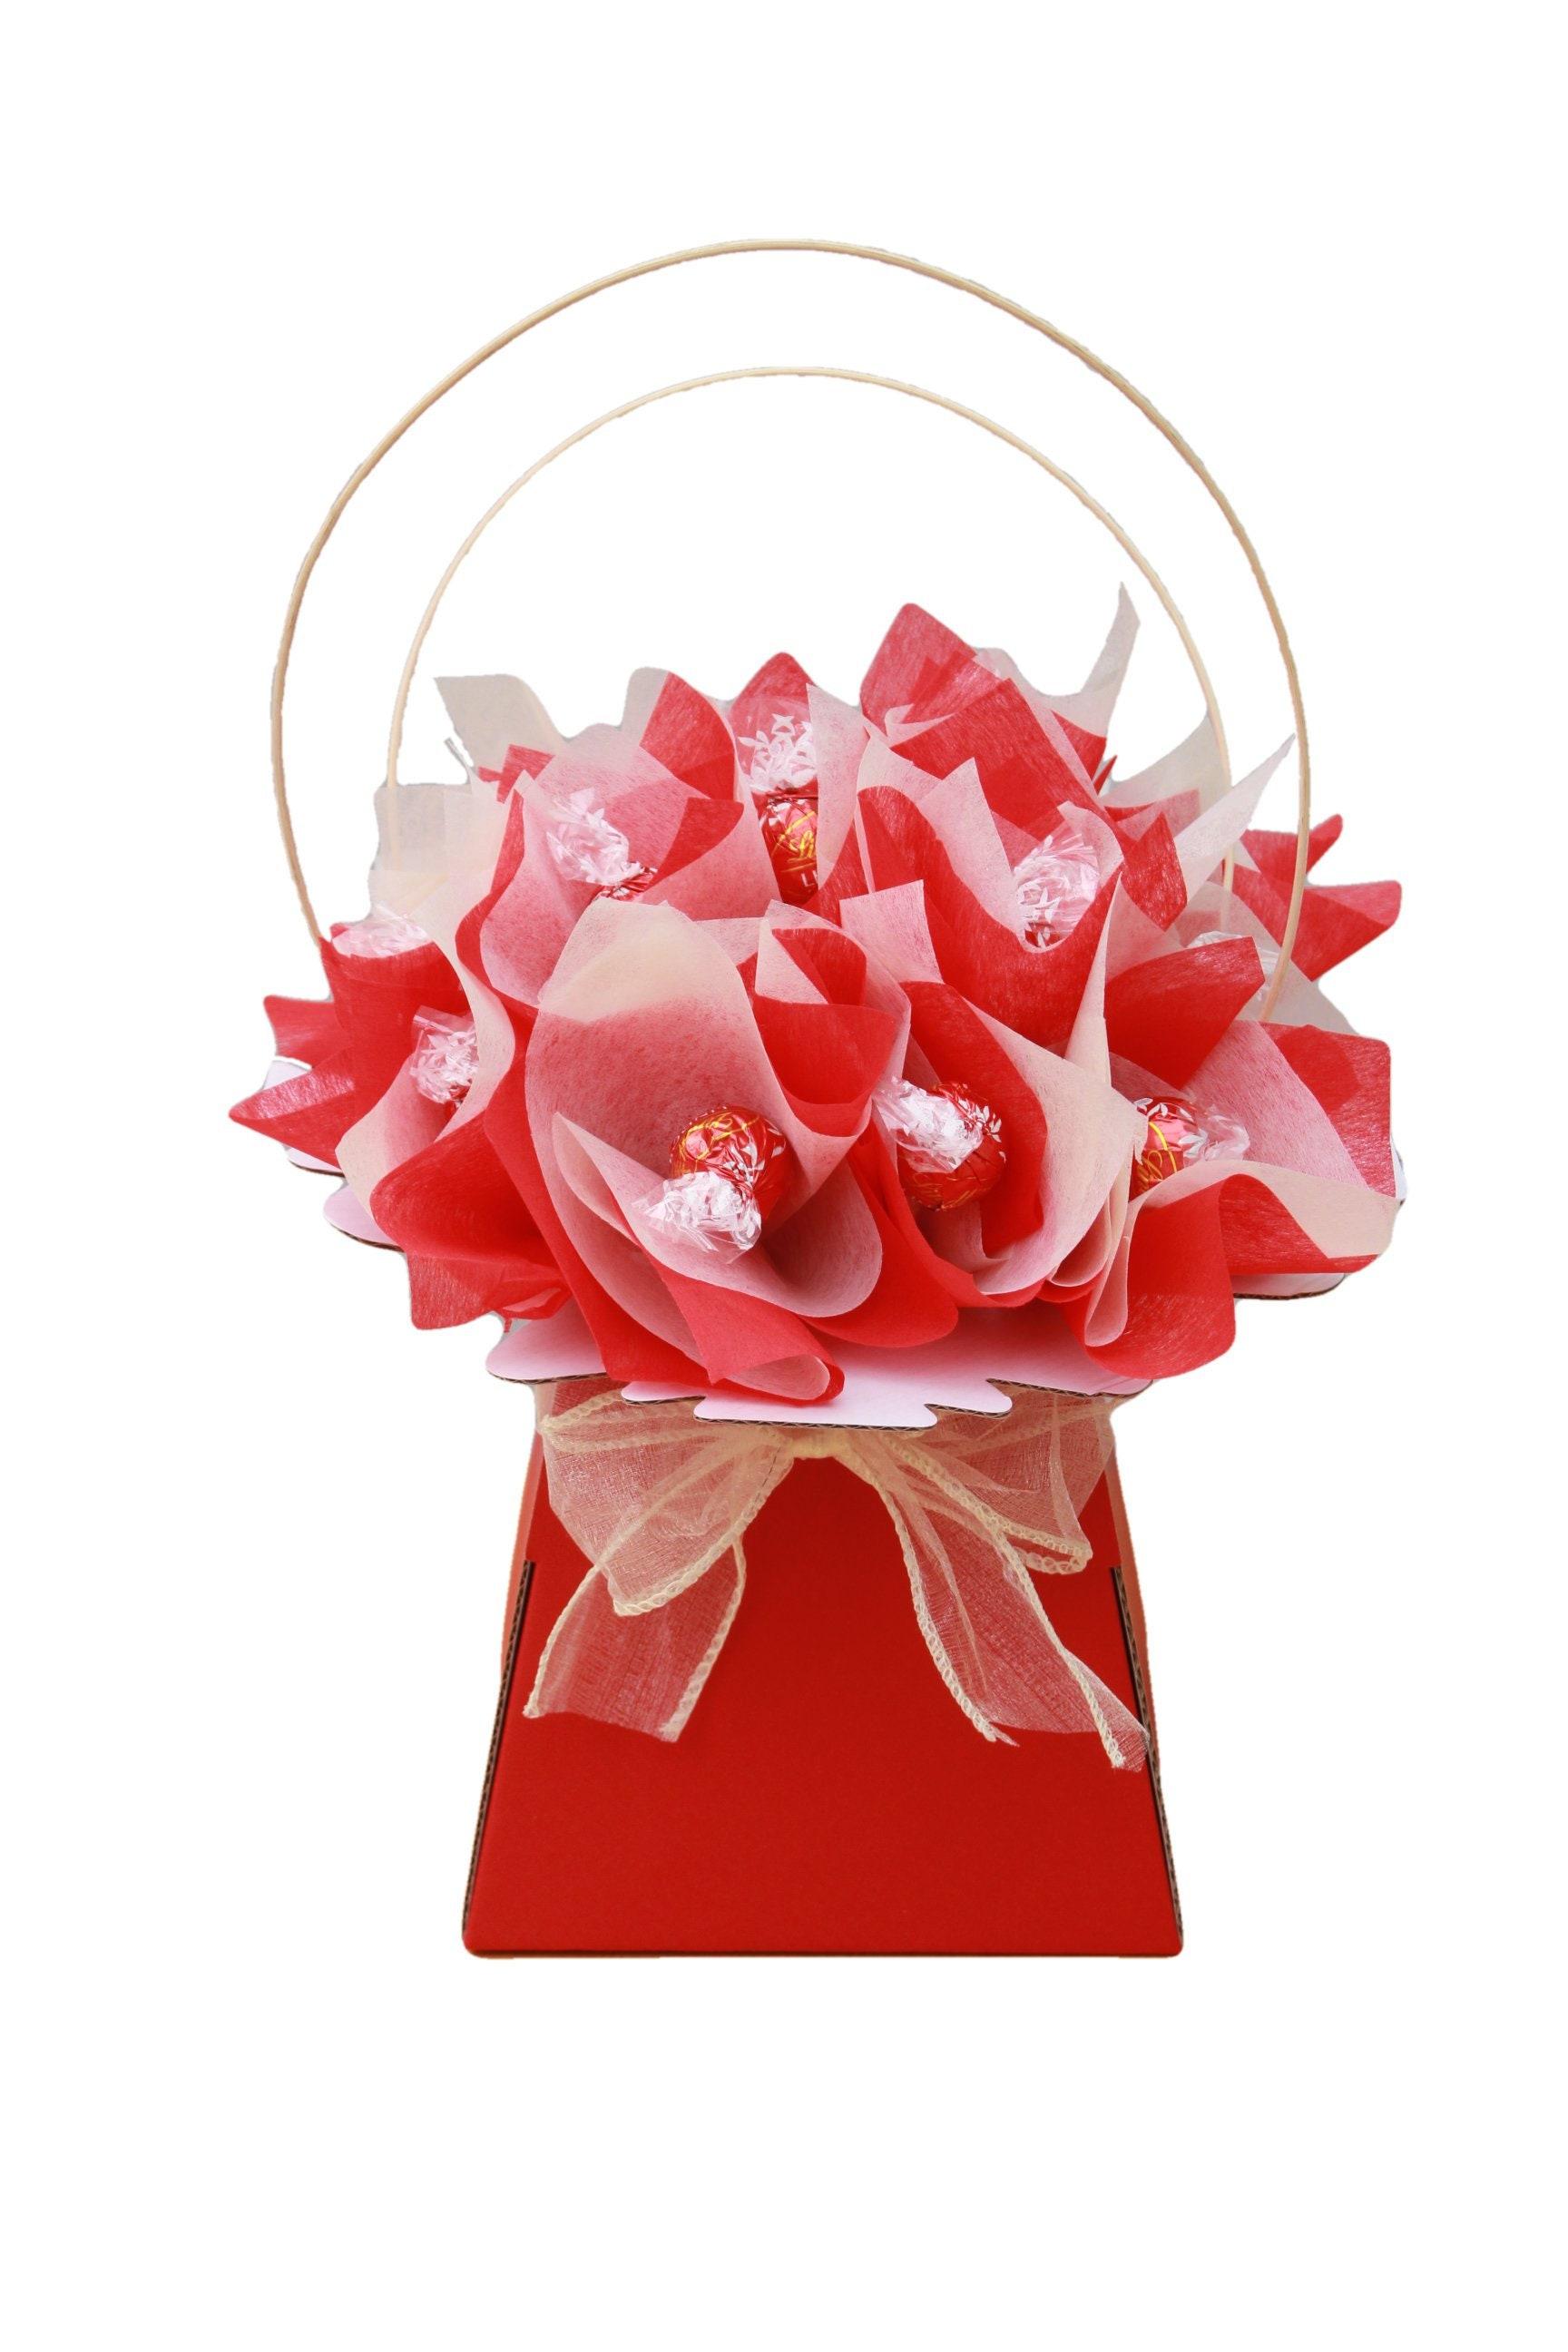 Chocolate Bouquet Lindt Lindor Sweet Hamper Gift | Etsy